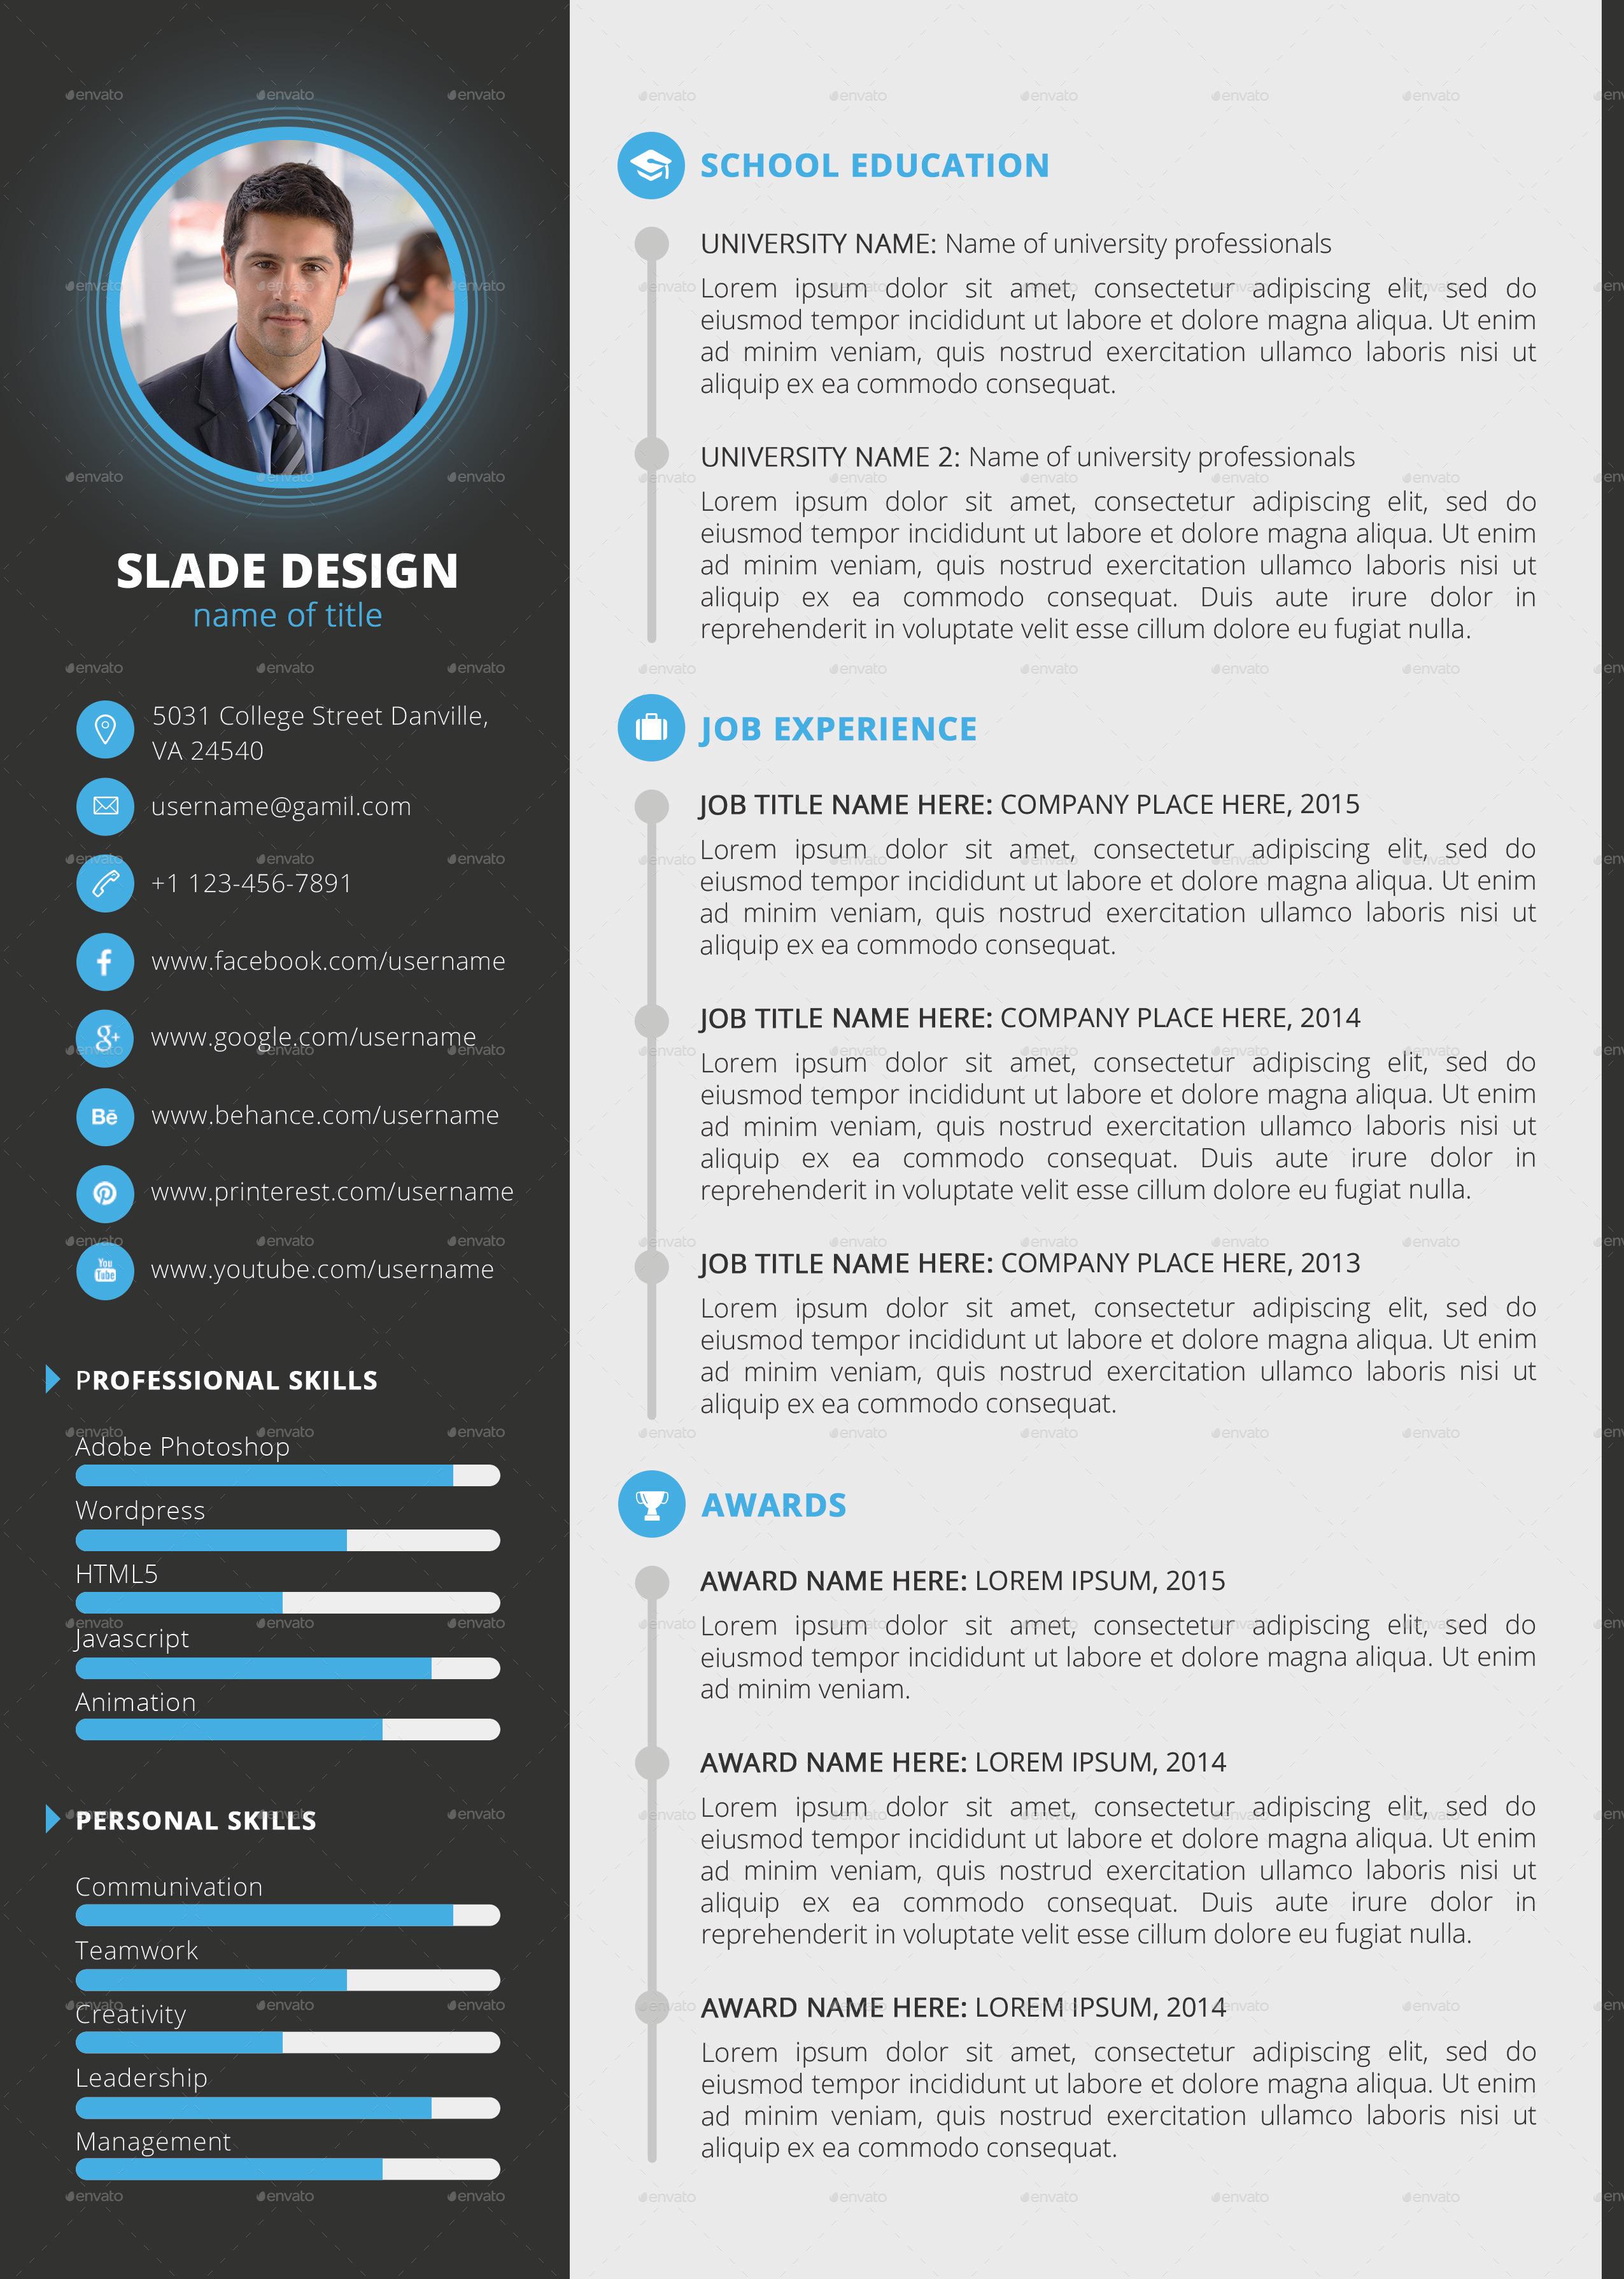 Slade Professional Quality CV  Resume Template by SladeDesign  GraphicRiver